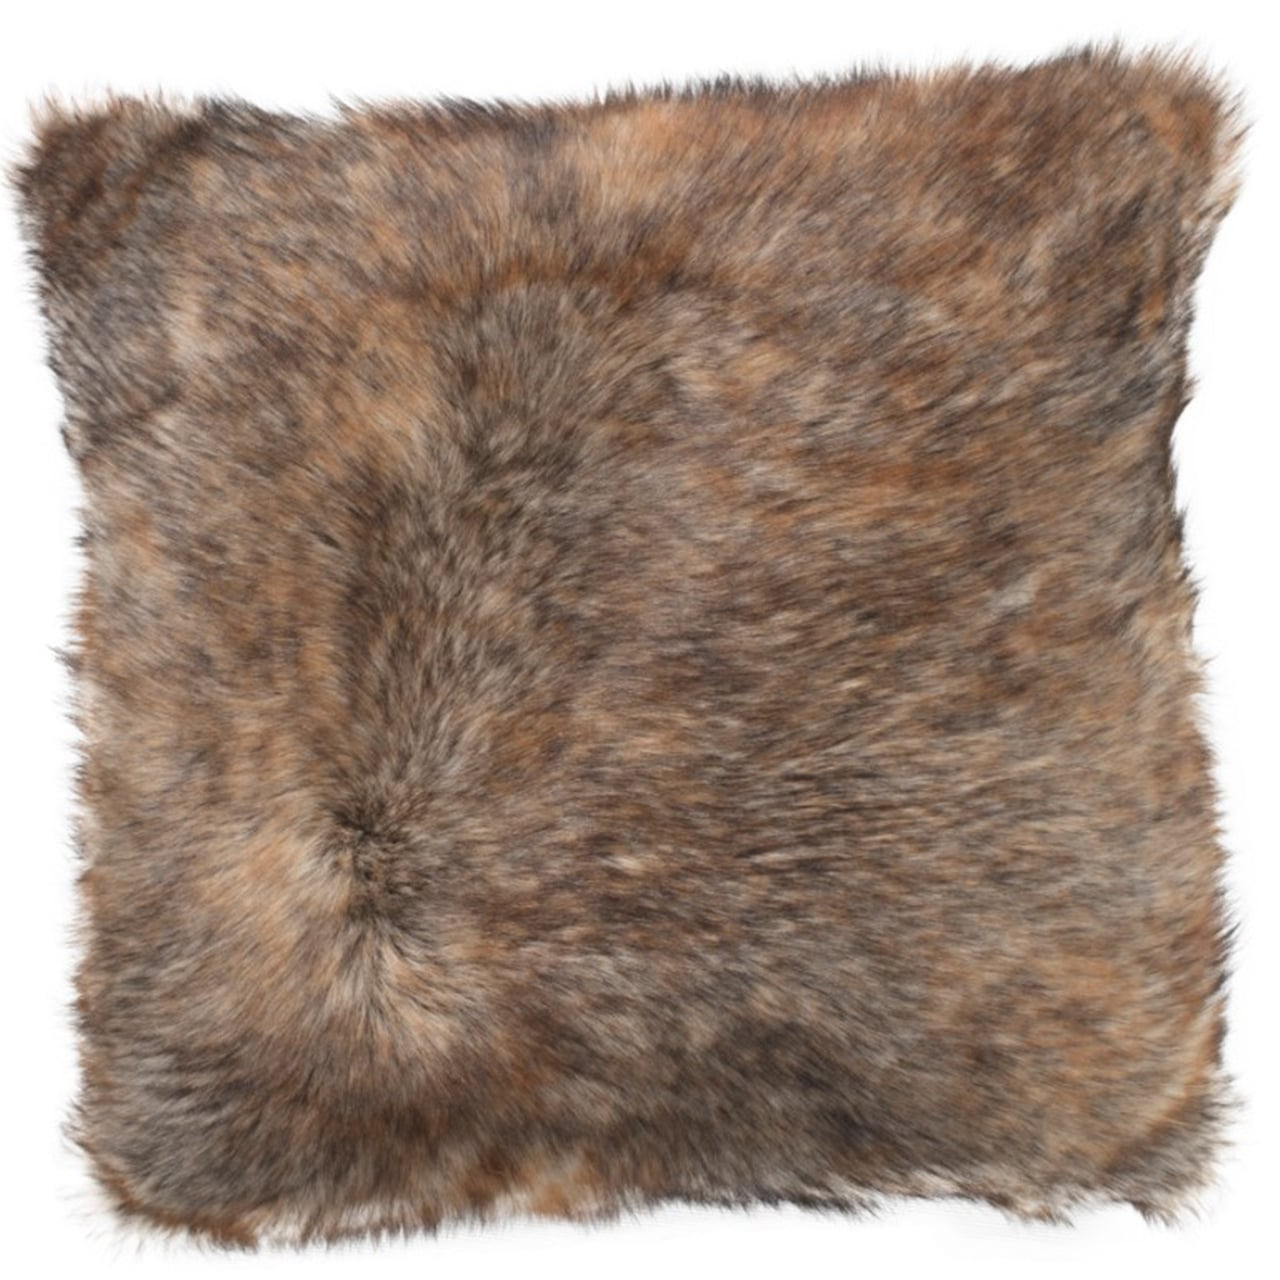 NEW-Shearling Pillow- Extra- 45x45cm (SPEXTBR4545) - ANVOGG FEEL SHEARLING | ANVOGG